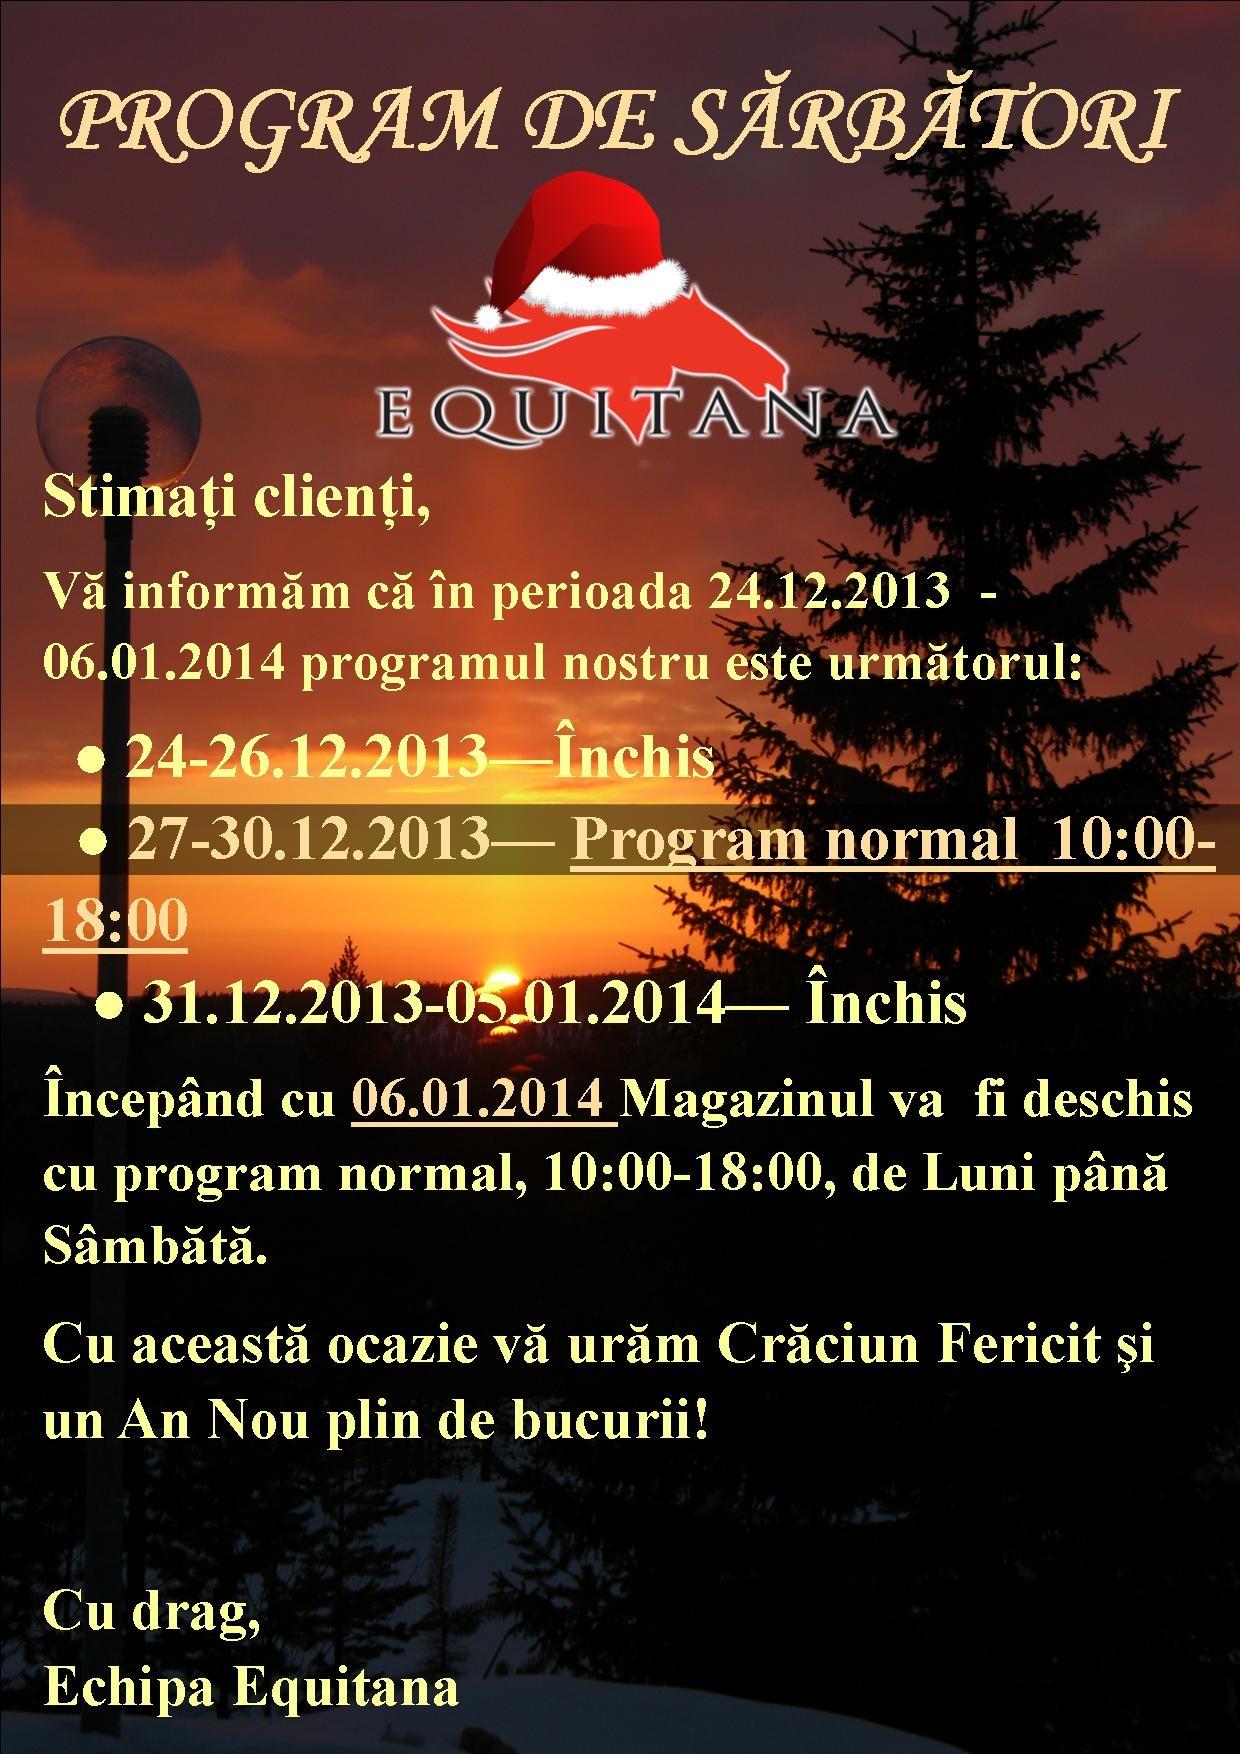 PROGRAM DE SARBATORI EQUITANA 2013-2014